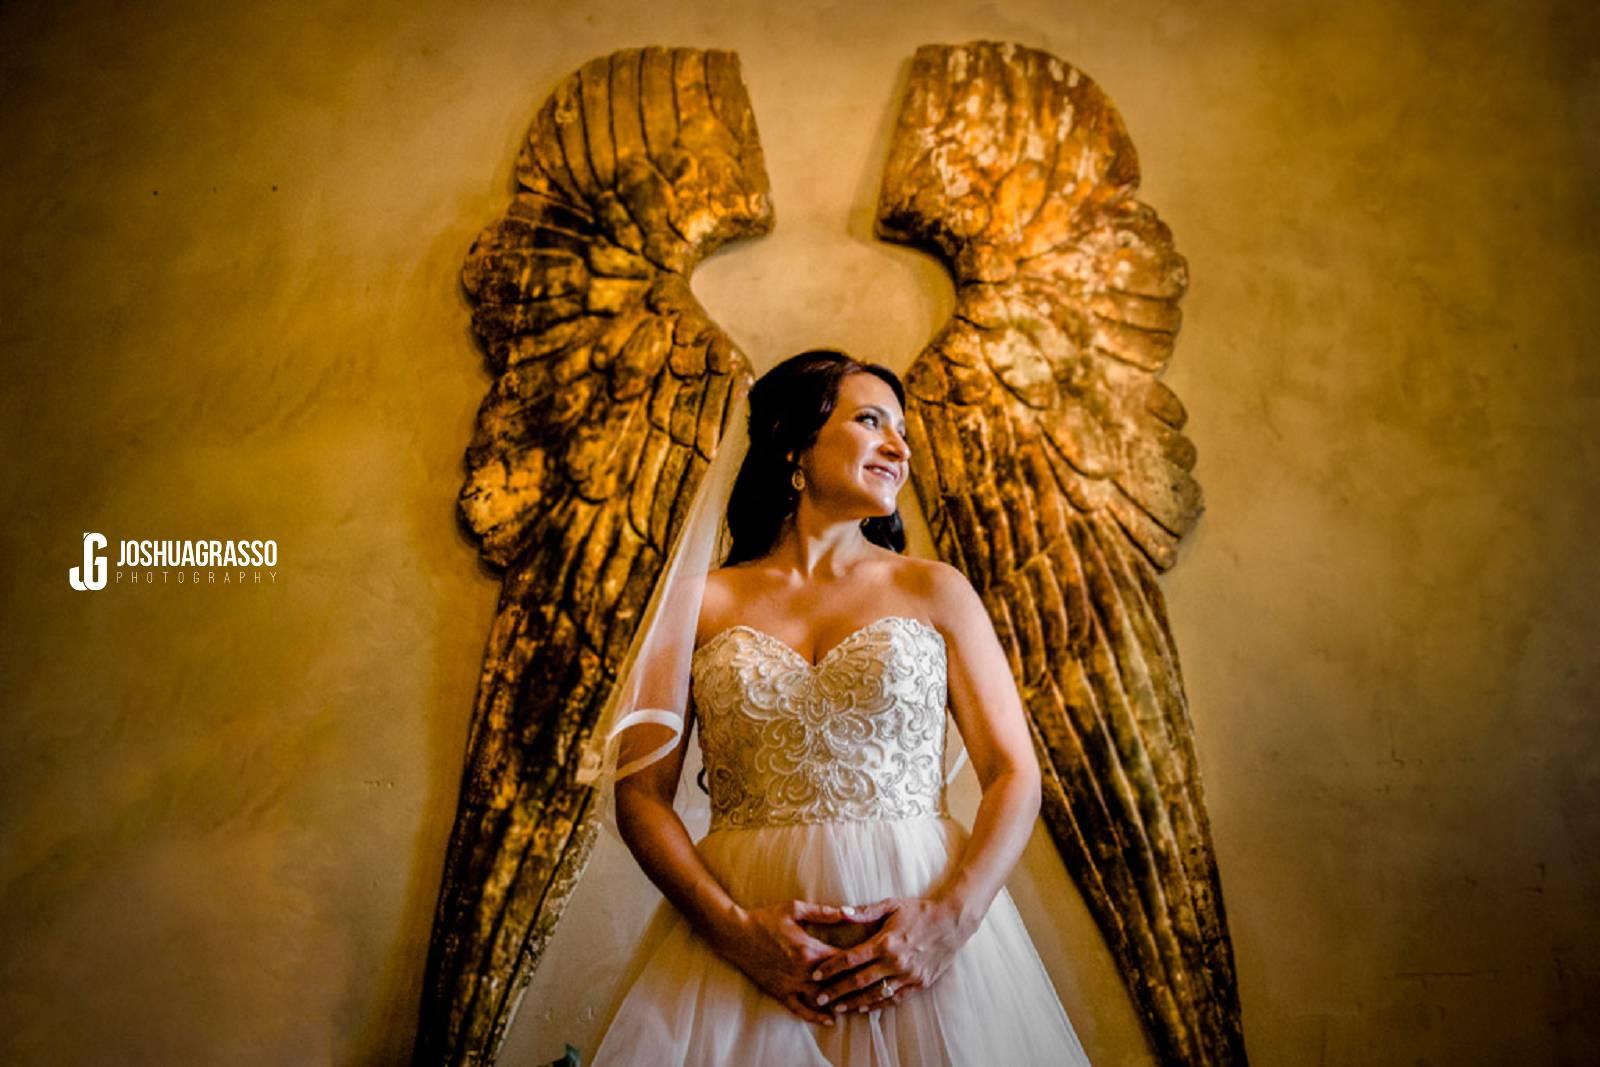 Best-Atlanta-wedding-Photographer-2018-Joshua-Grasso (18 of 54)